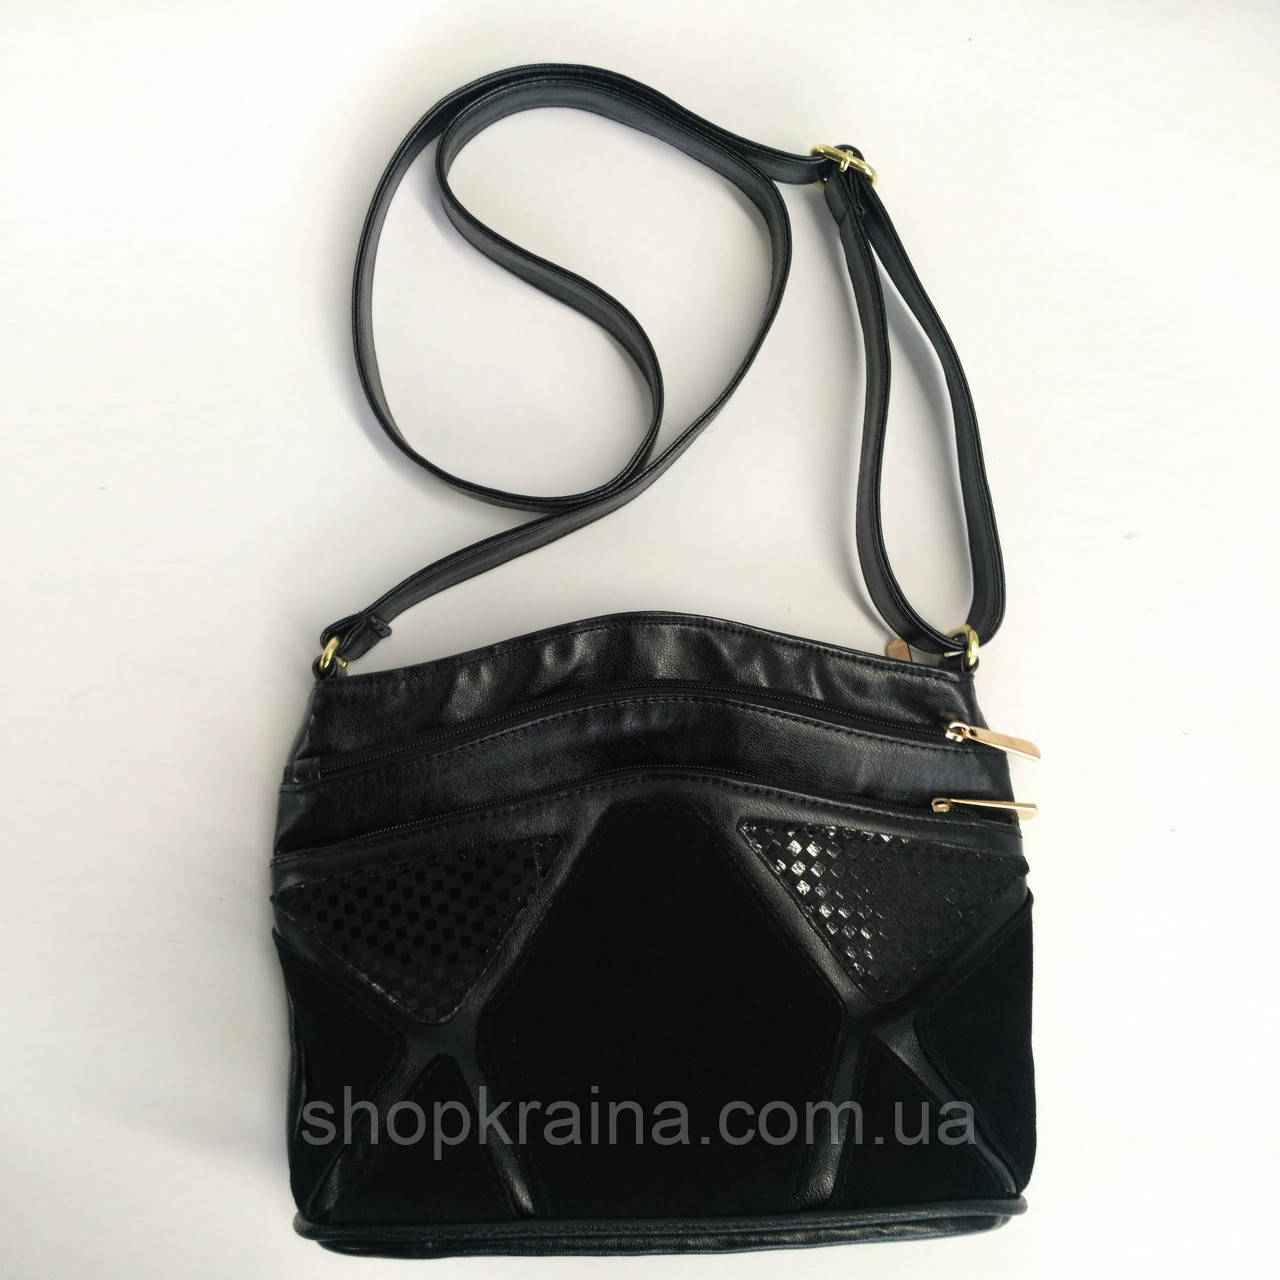 Cумка black elegance F 27*22*11 см